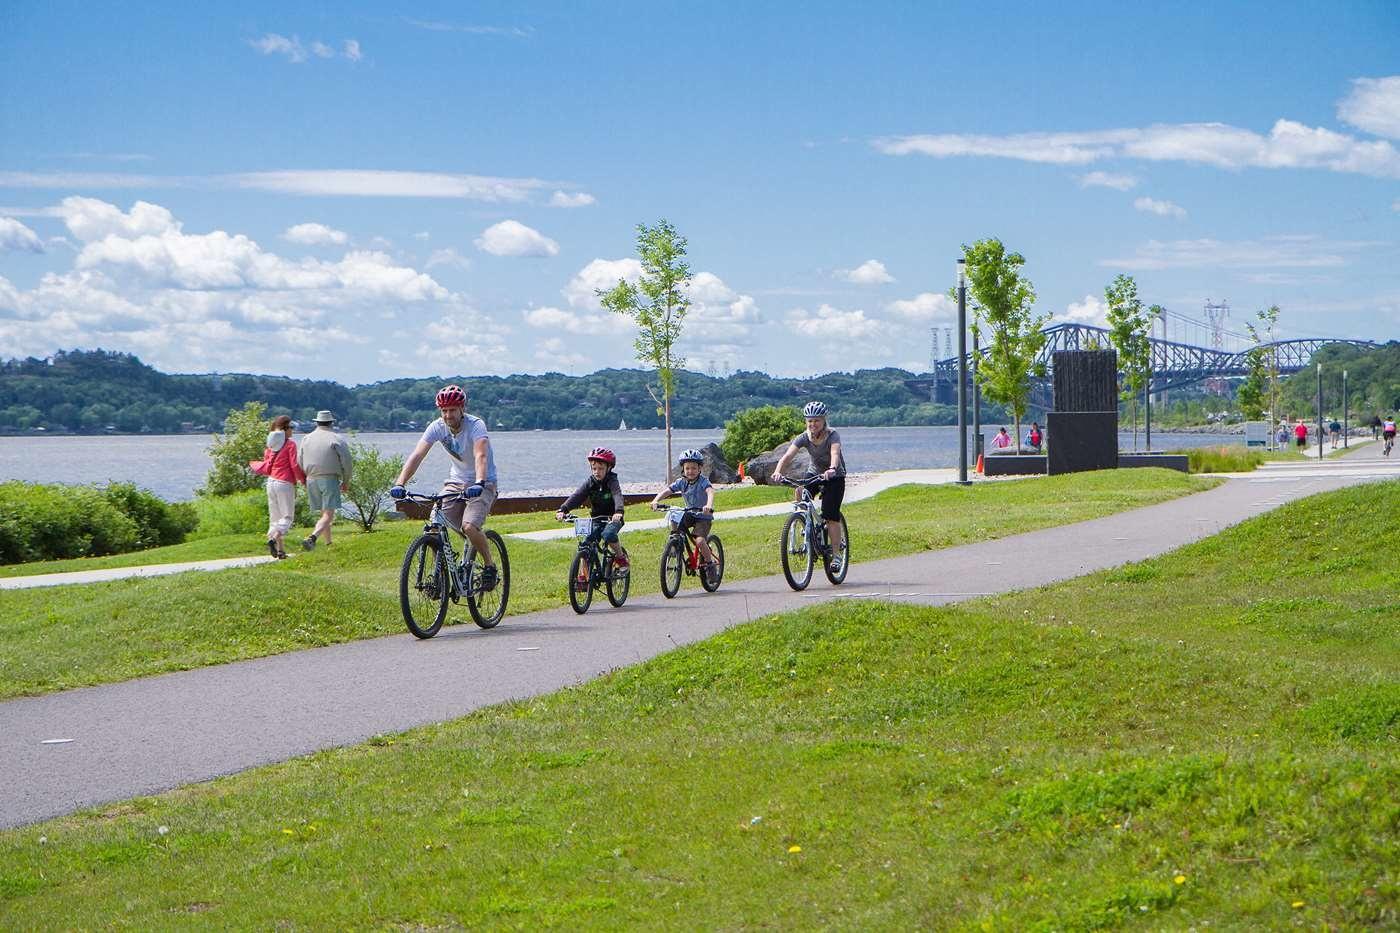 Quebec along the river bike tour, 65$